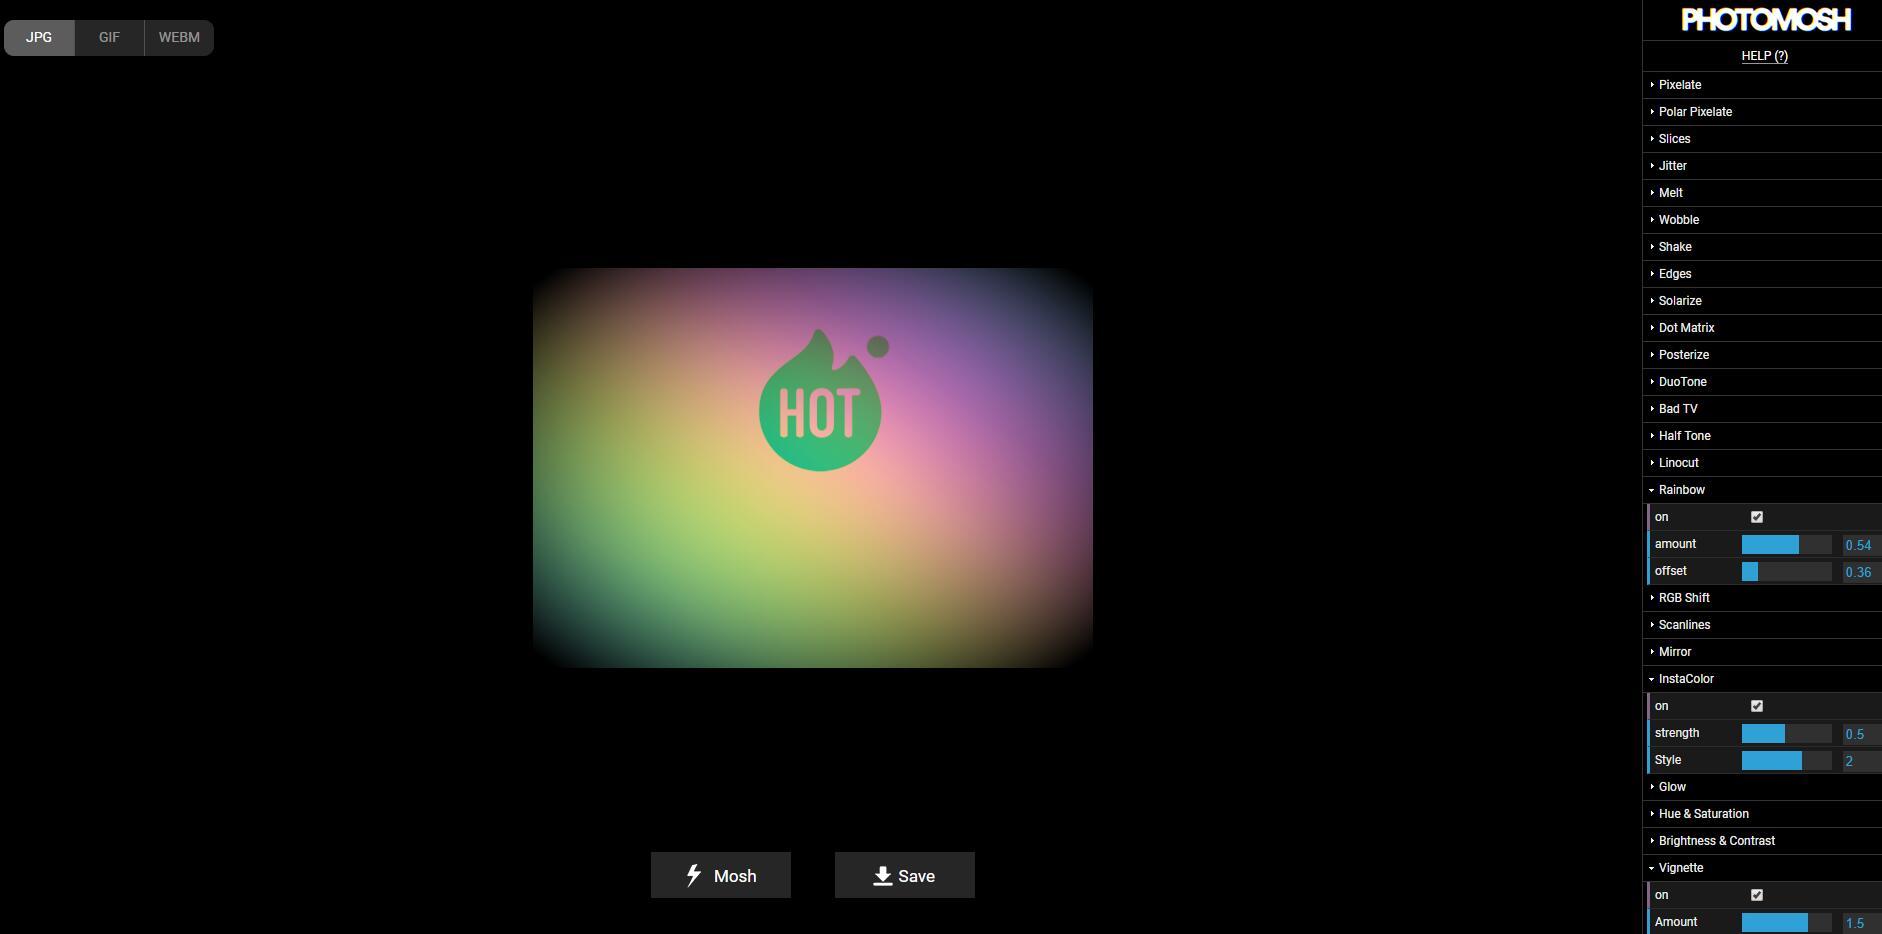 PHOTOMOSH-图片视频特效在线工具